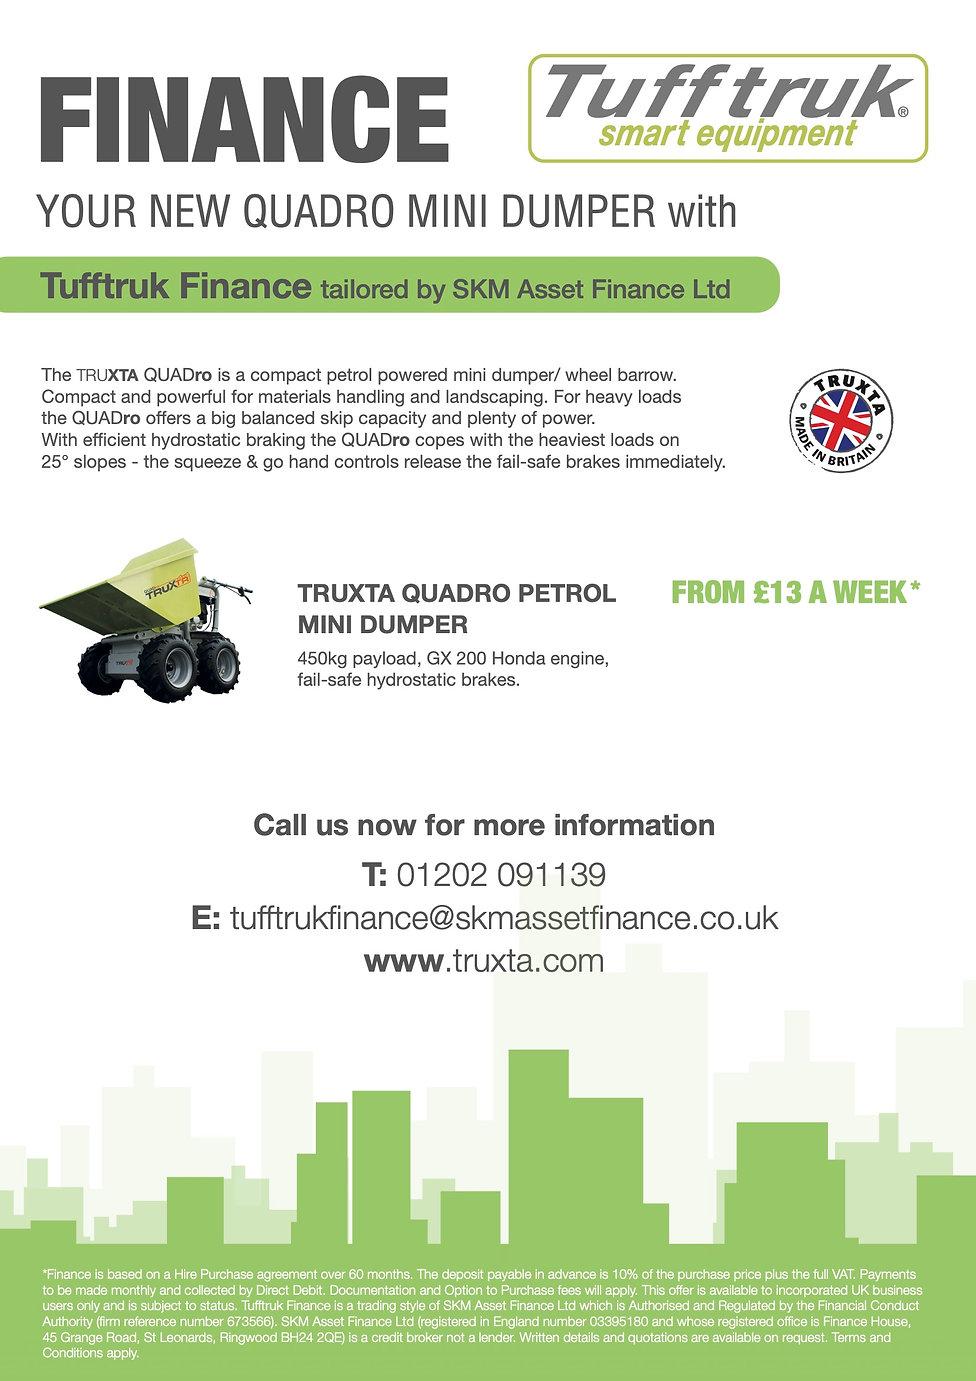 TRUXTA Quadro Finance Flyer.jpg